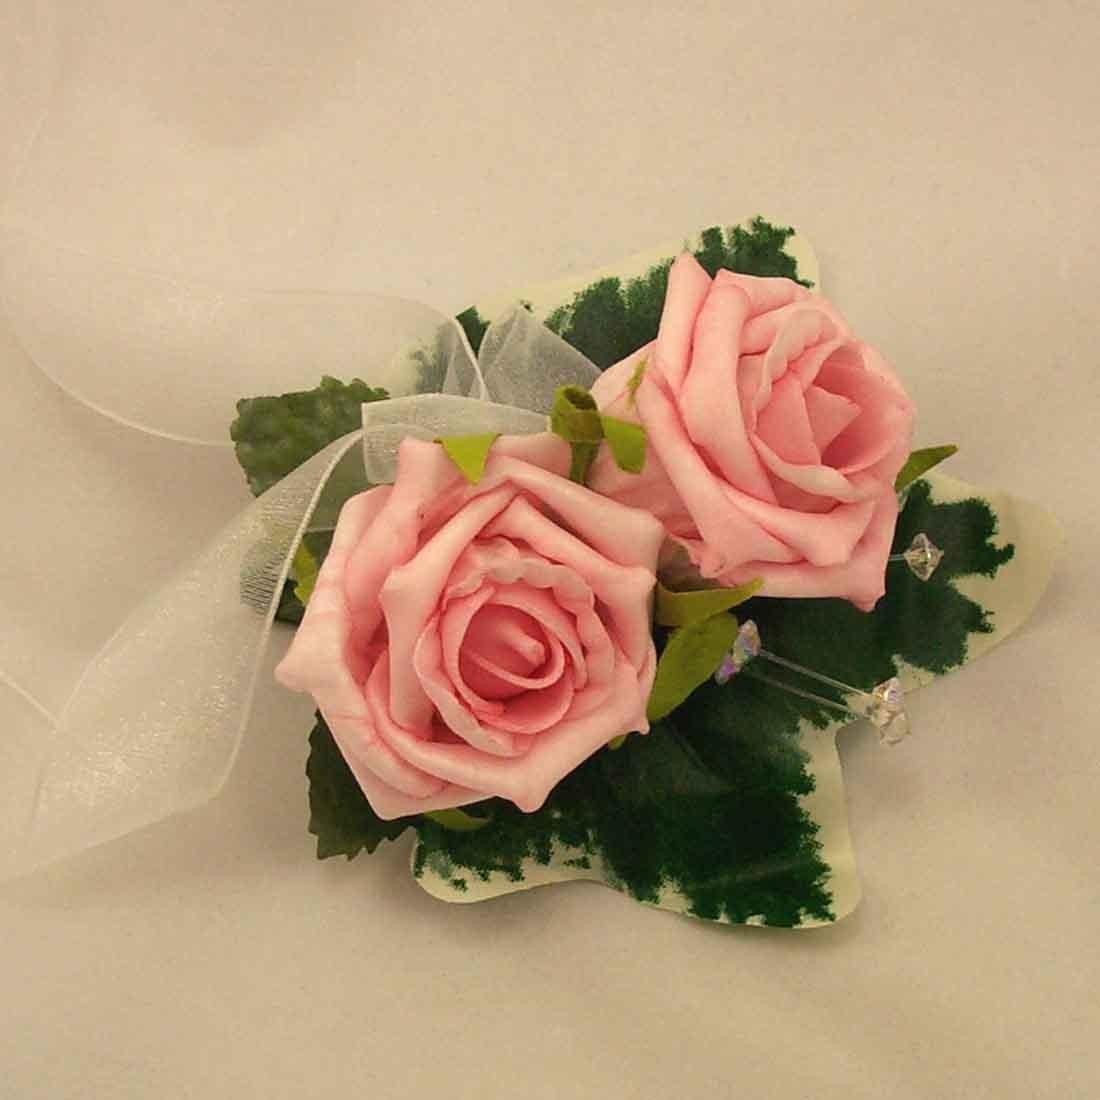 wrist corsages - pink rose lady u0026 39 s wrist corsage